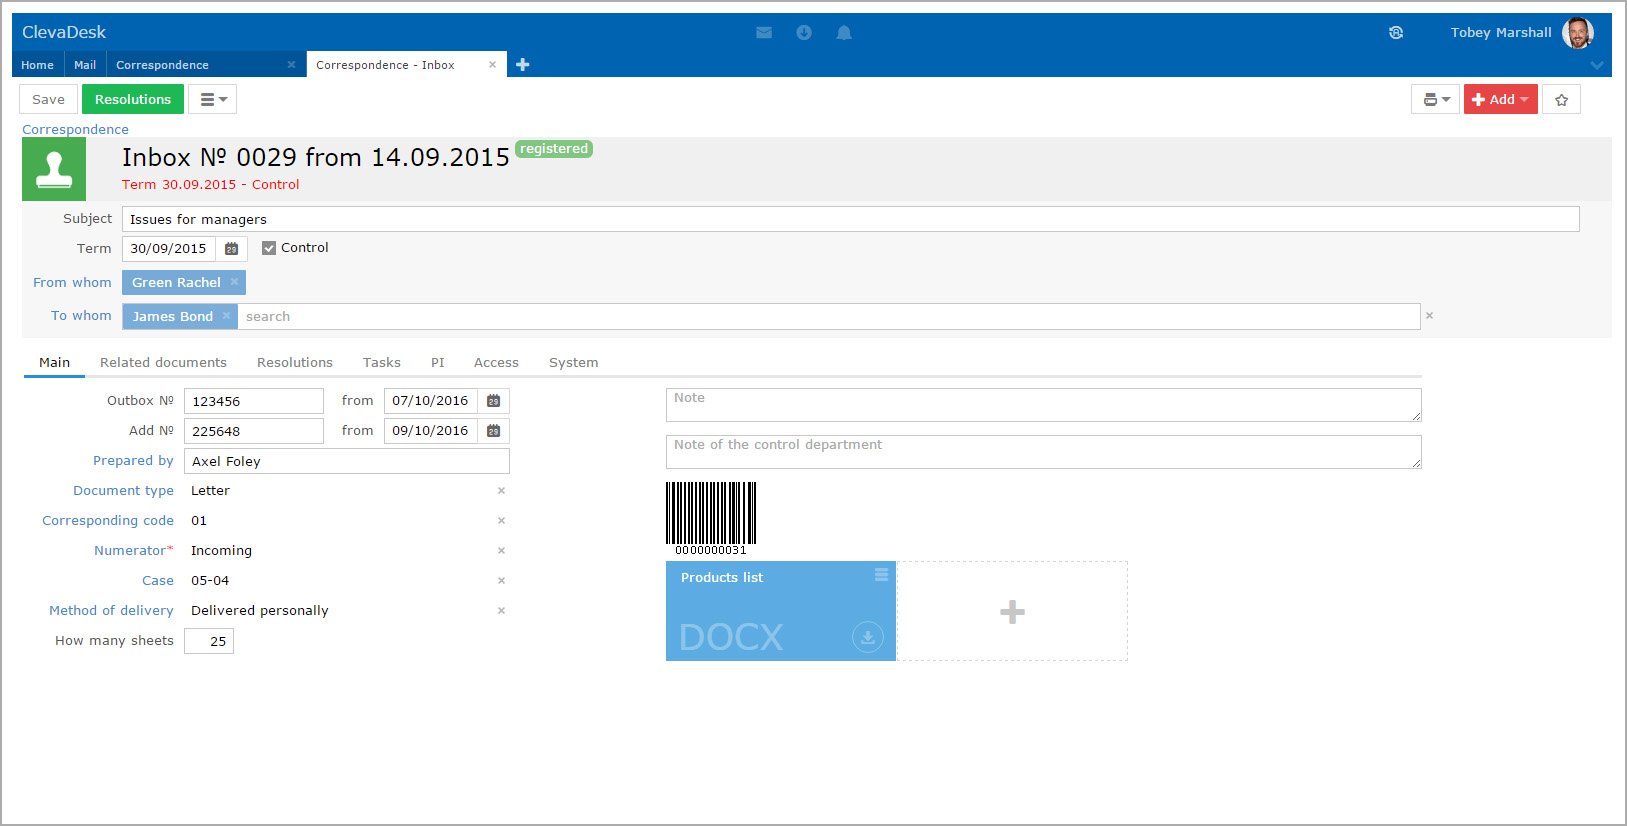 ClevaDesk correspondence application